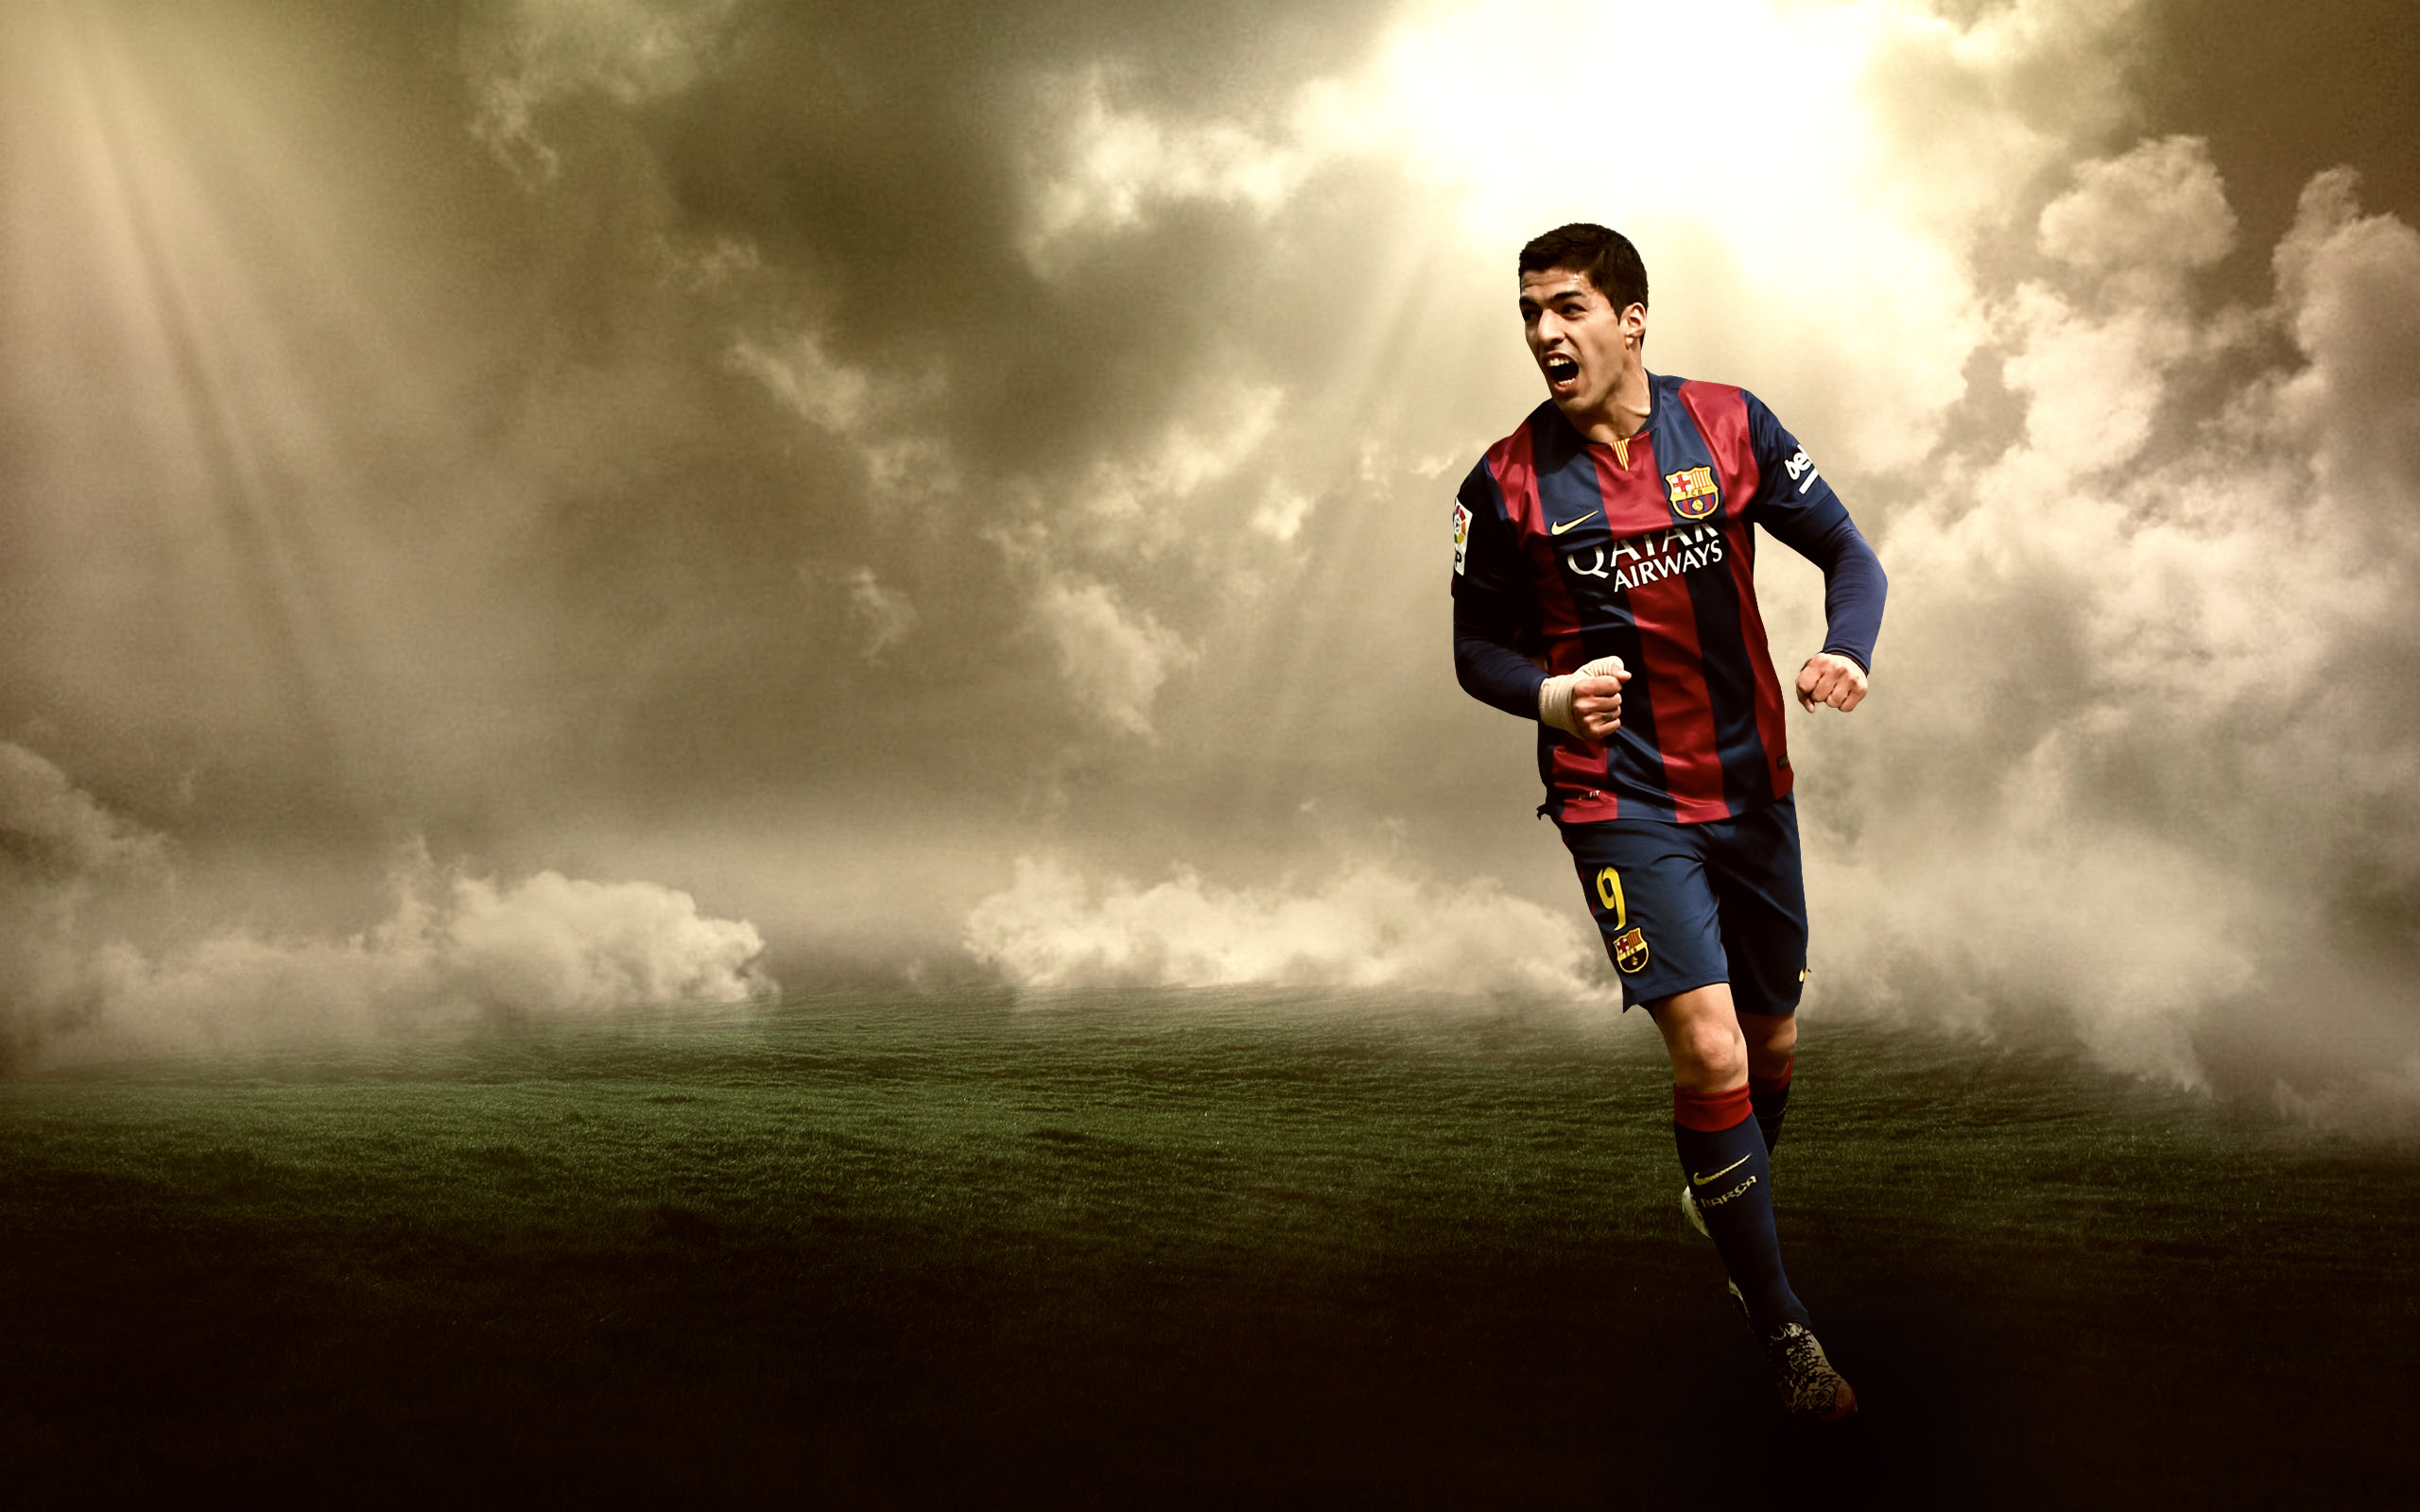 Gambar Wallpaper Terbaru Luiz Suarez Musim 2015/2016